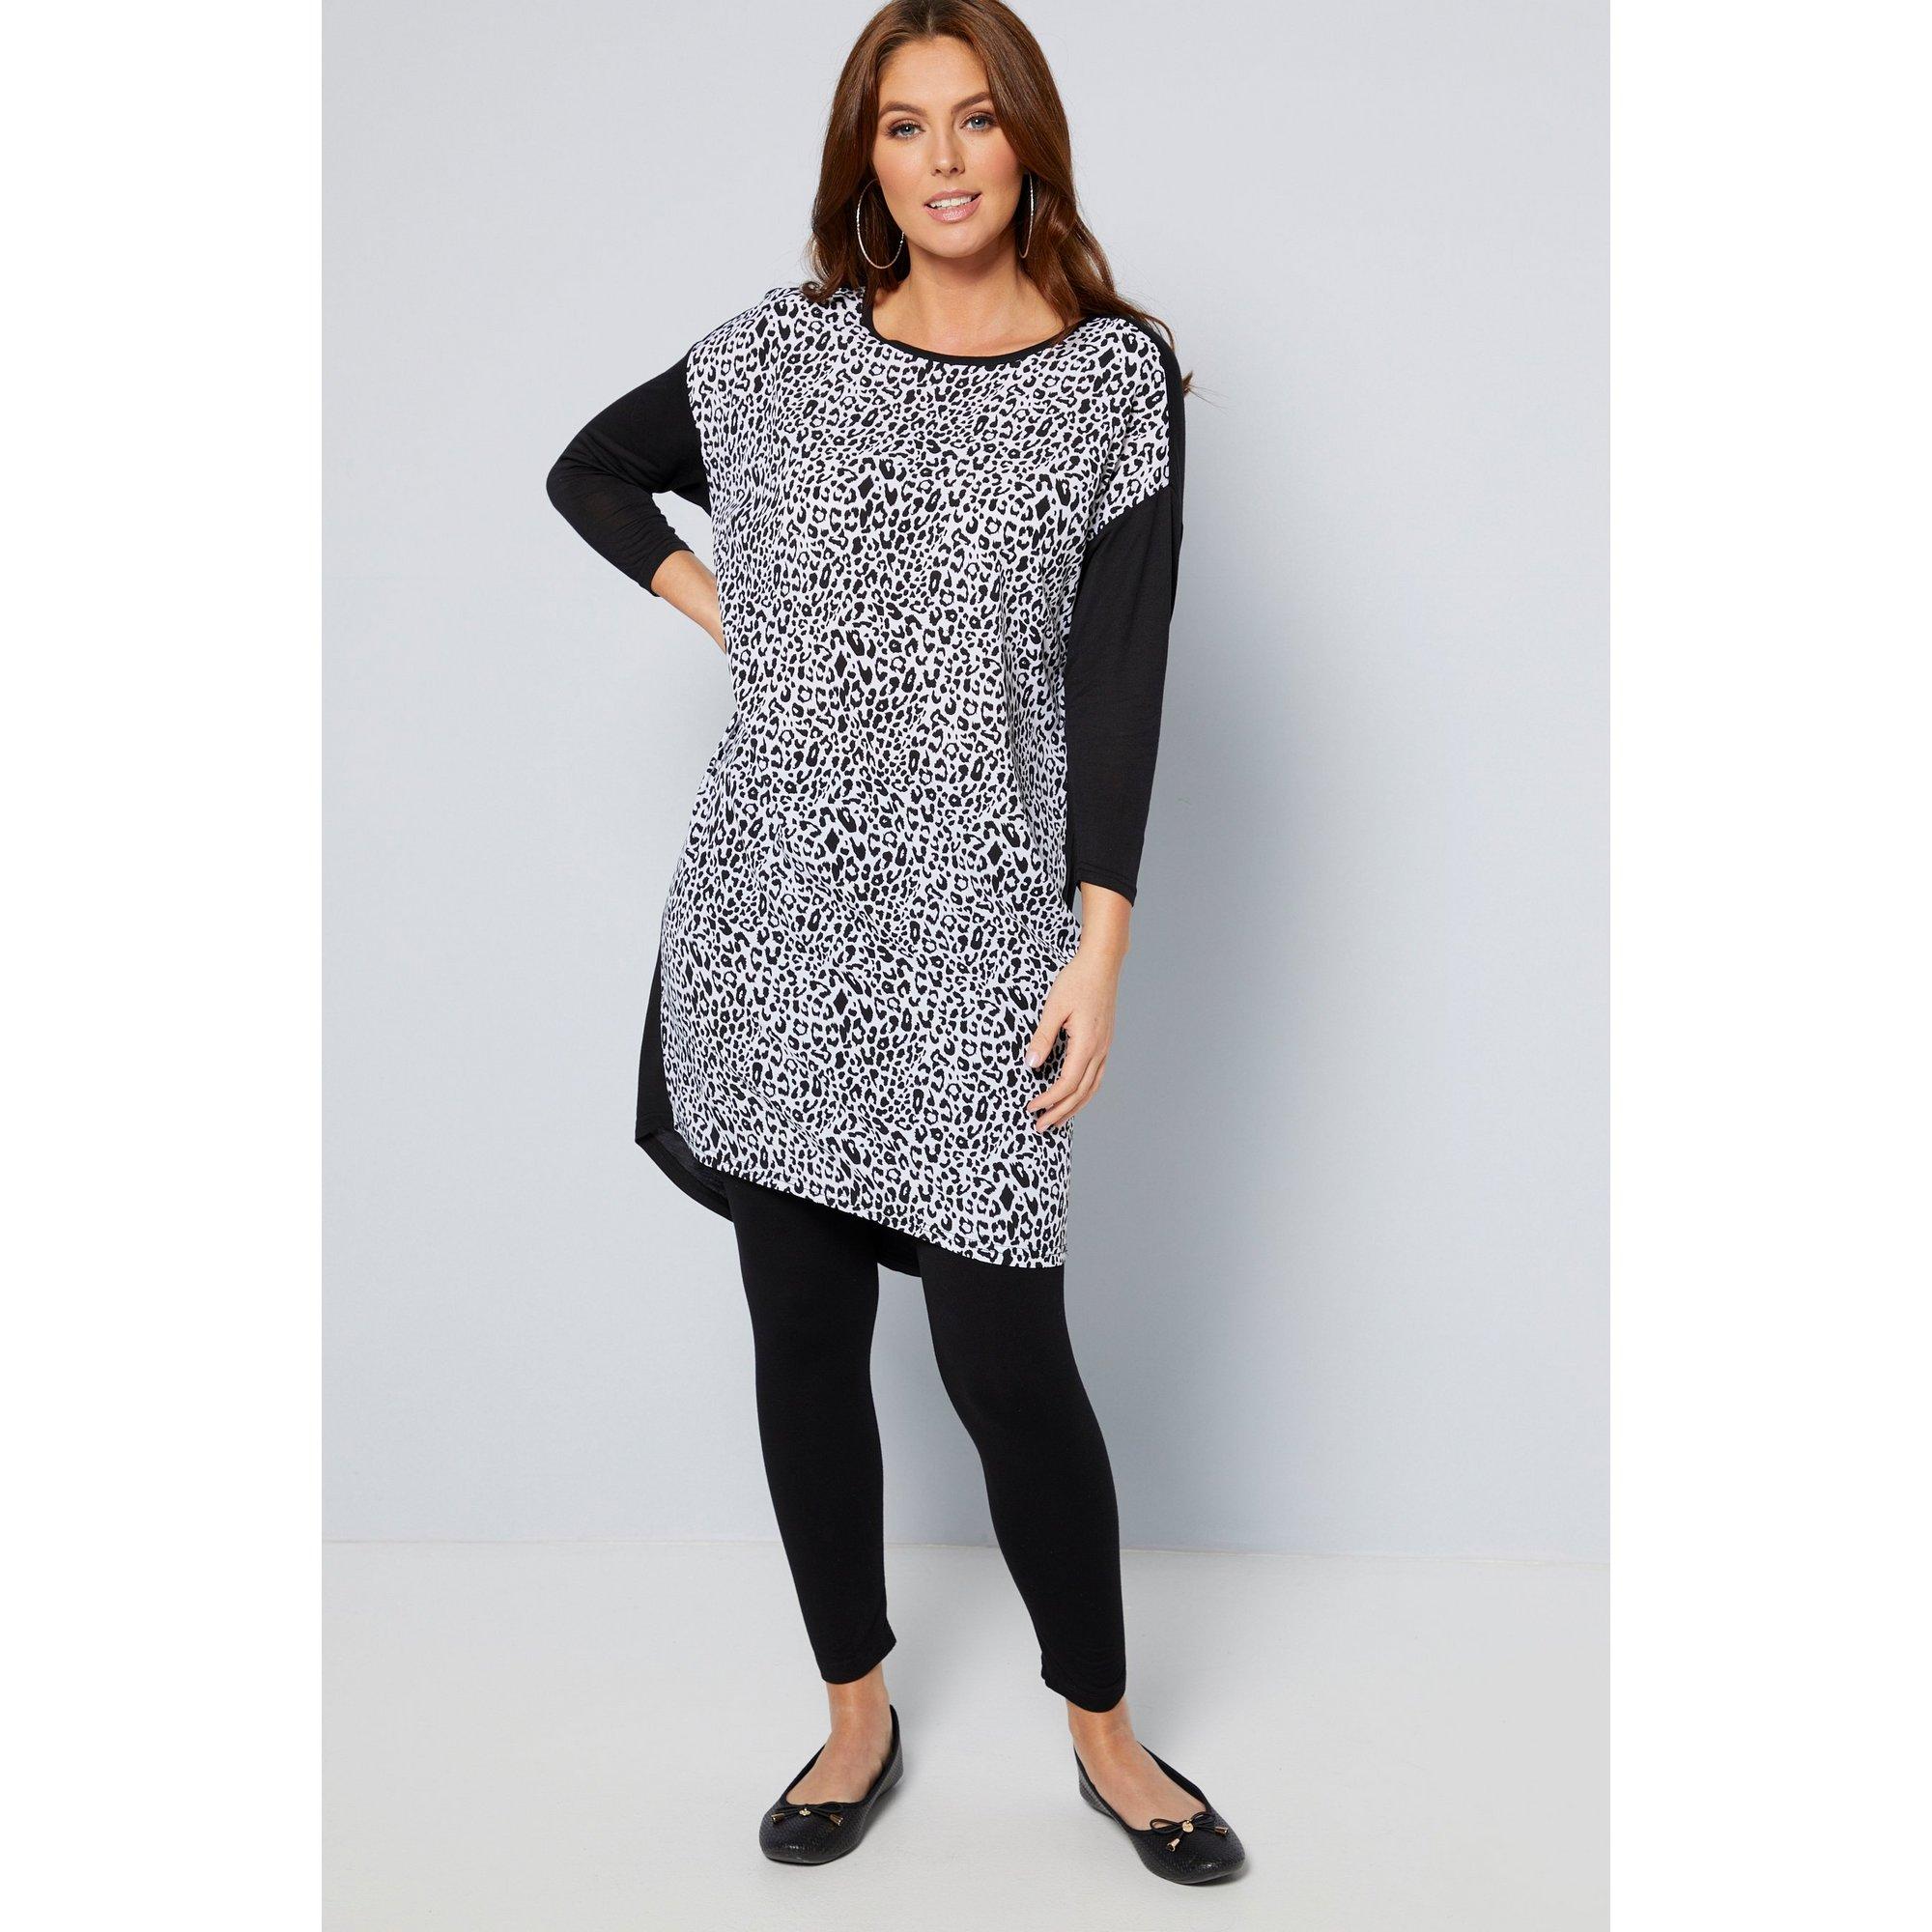 Image of 3/4 Sleeve Woven Animal Mono Print Front Panel Tunic Dress